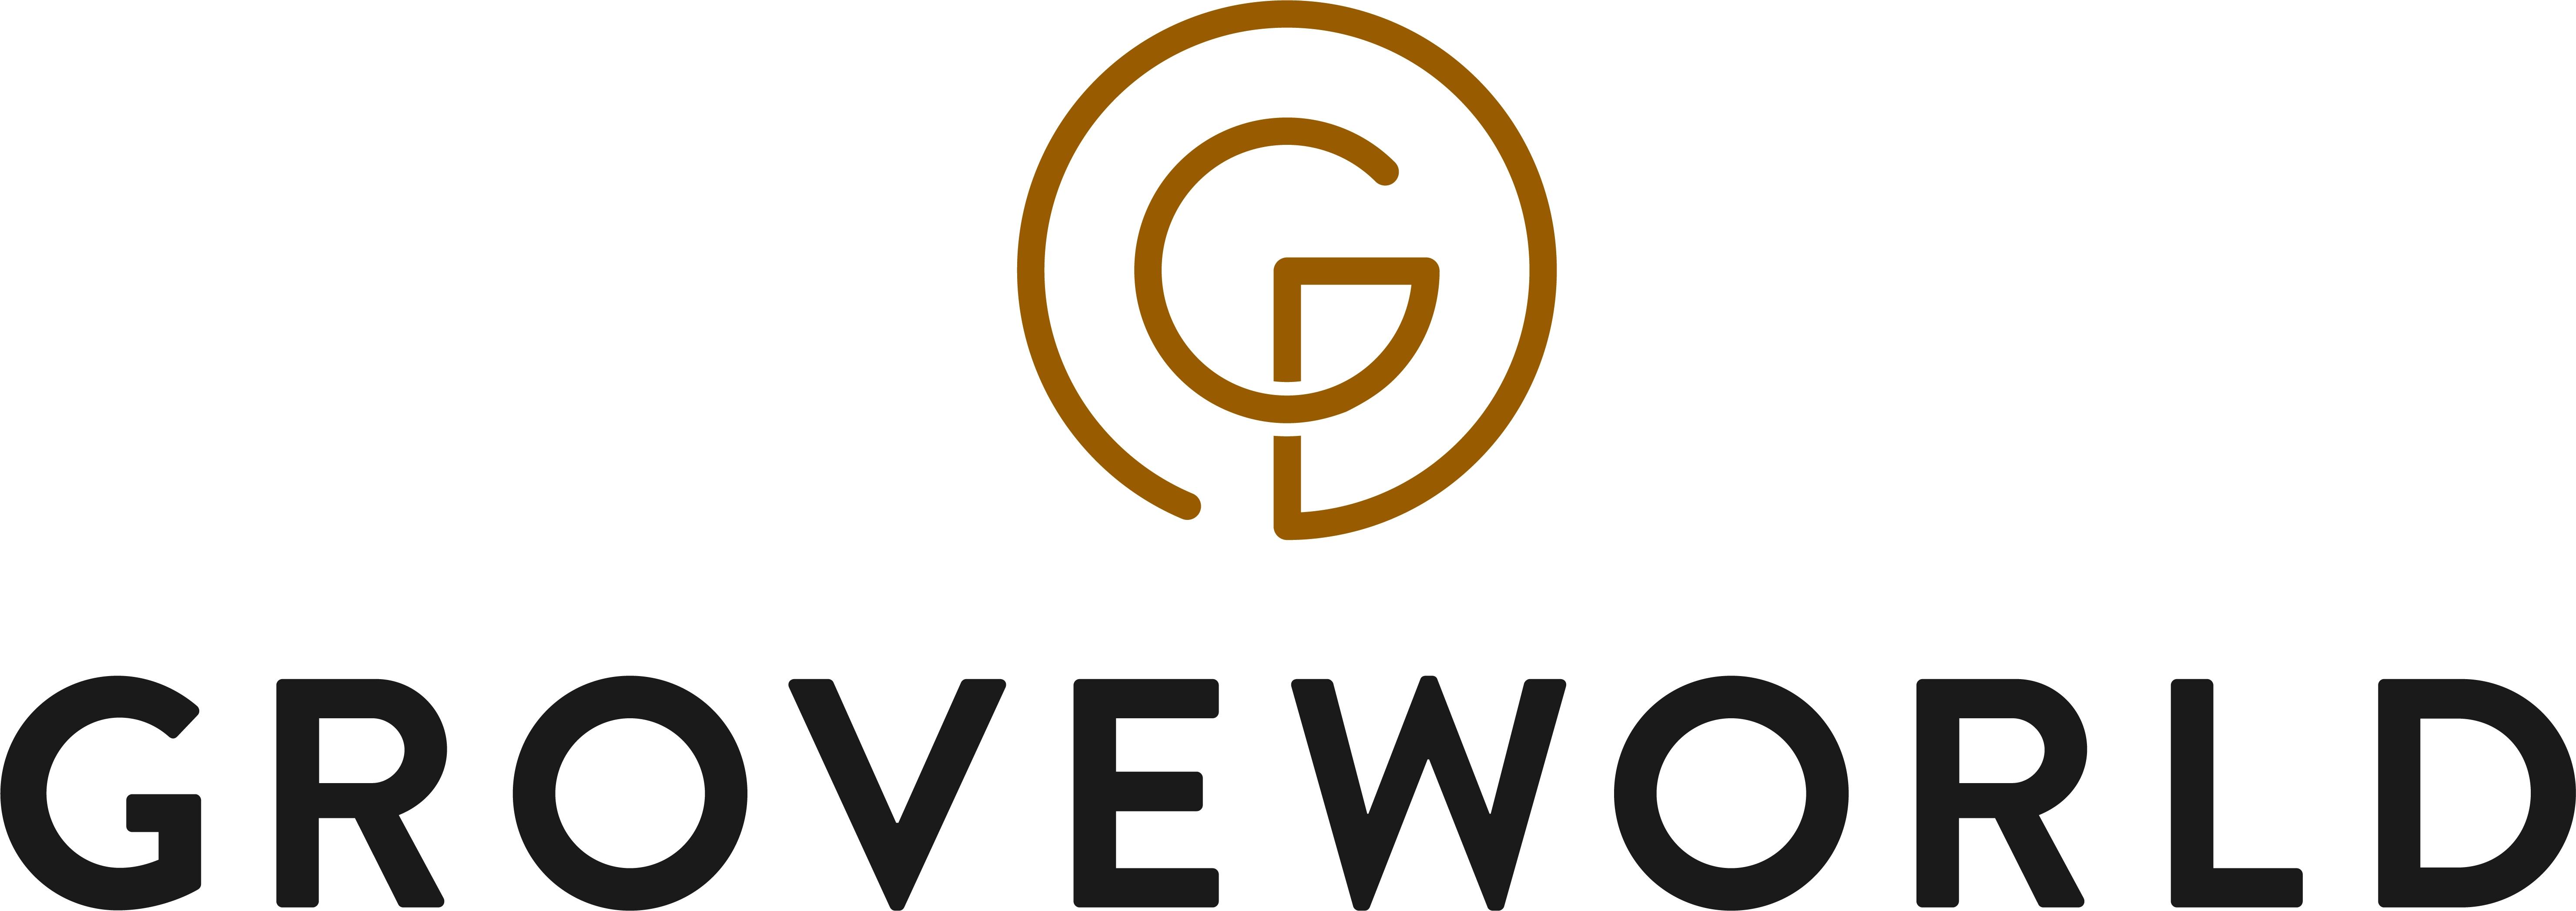 groveworld_logo_print_CMYK.jpg